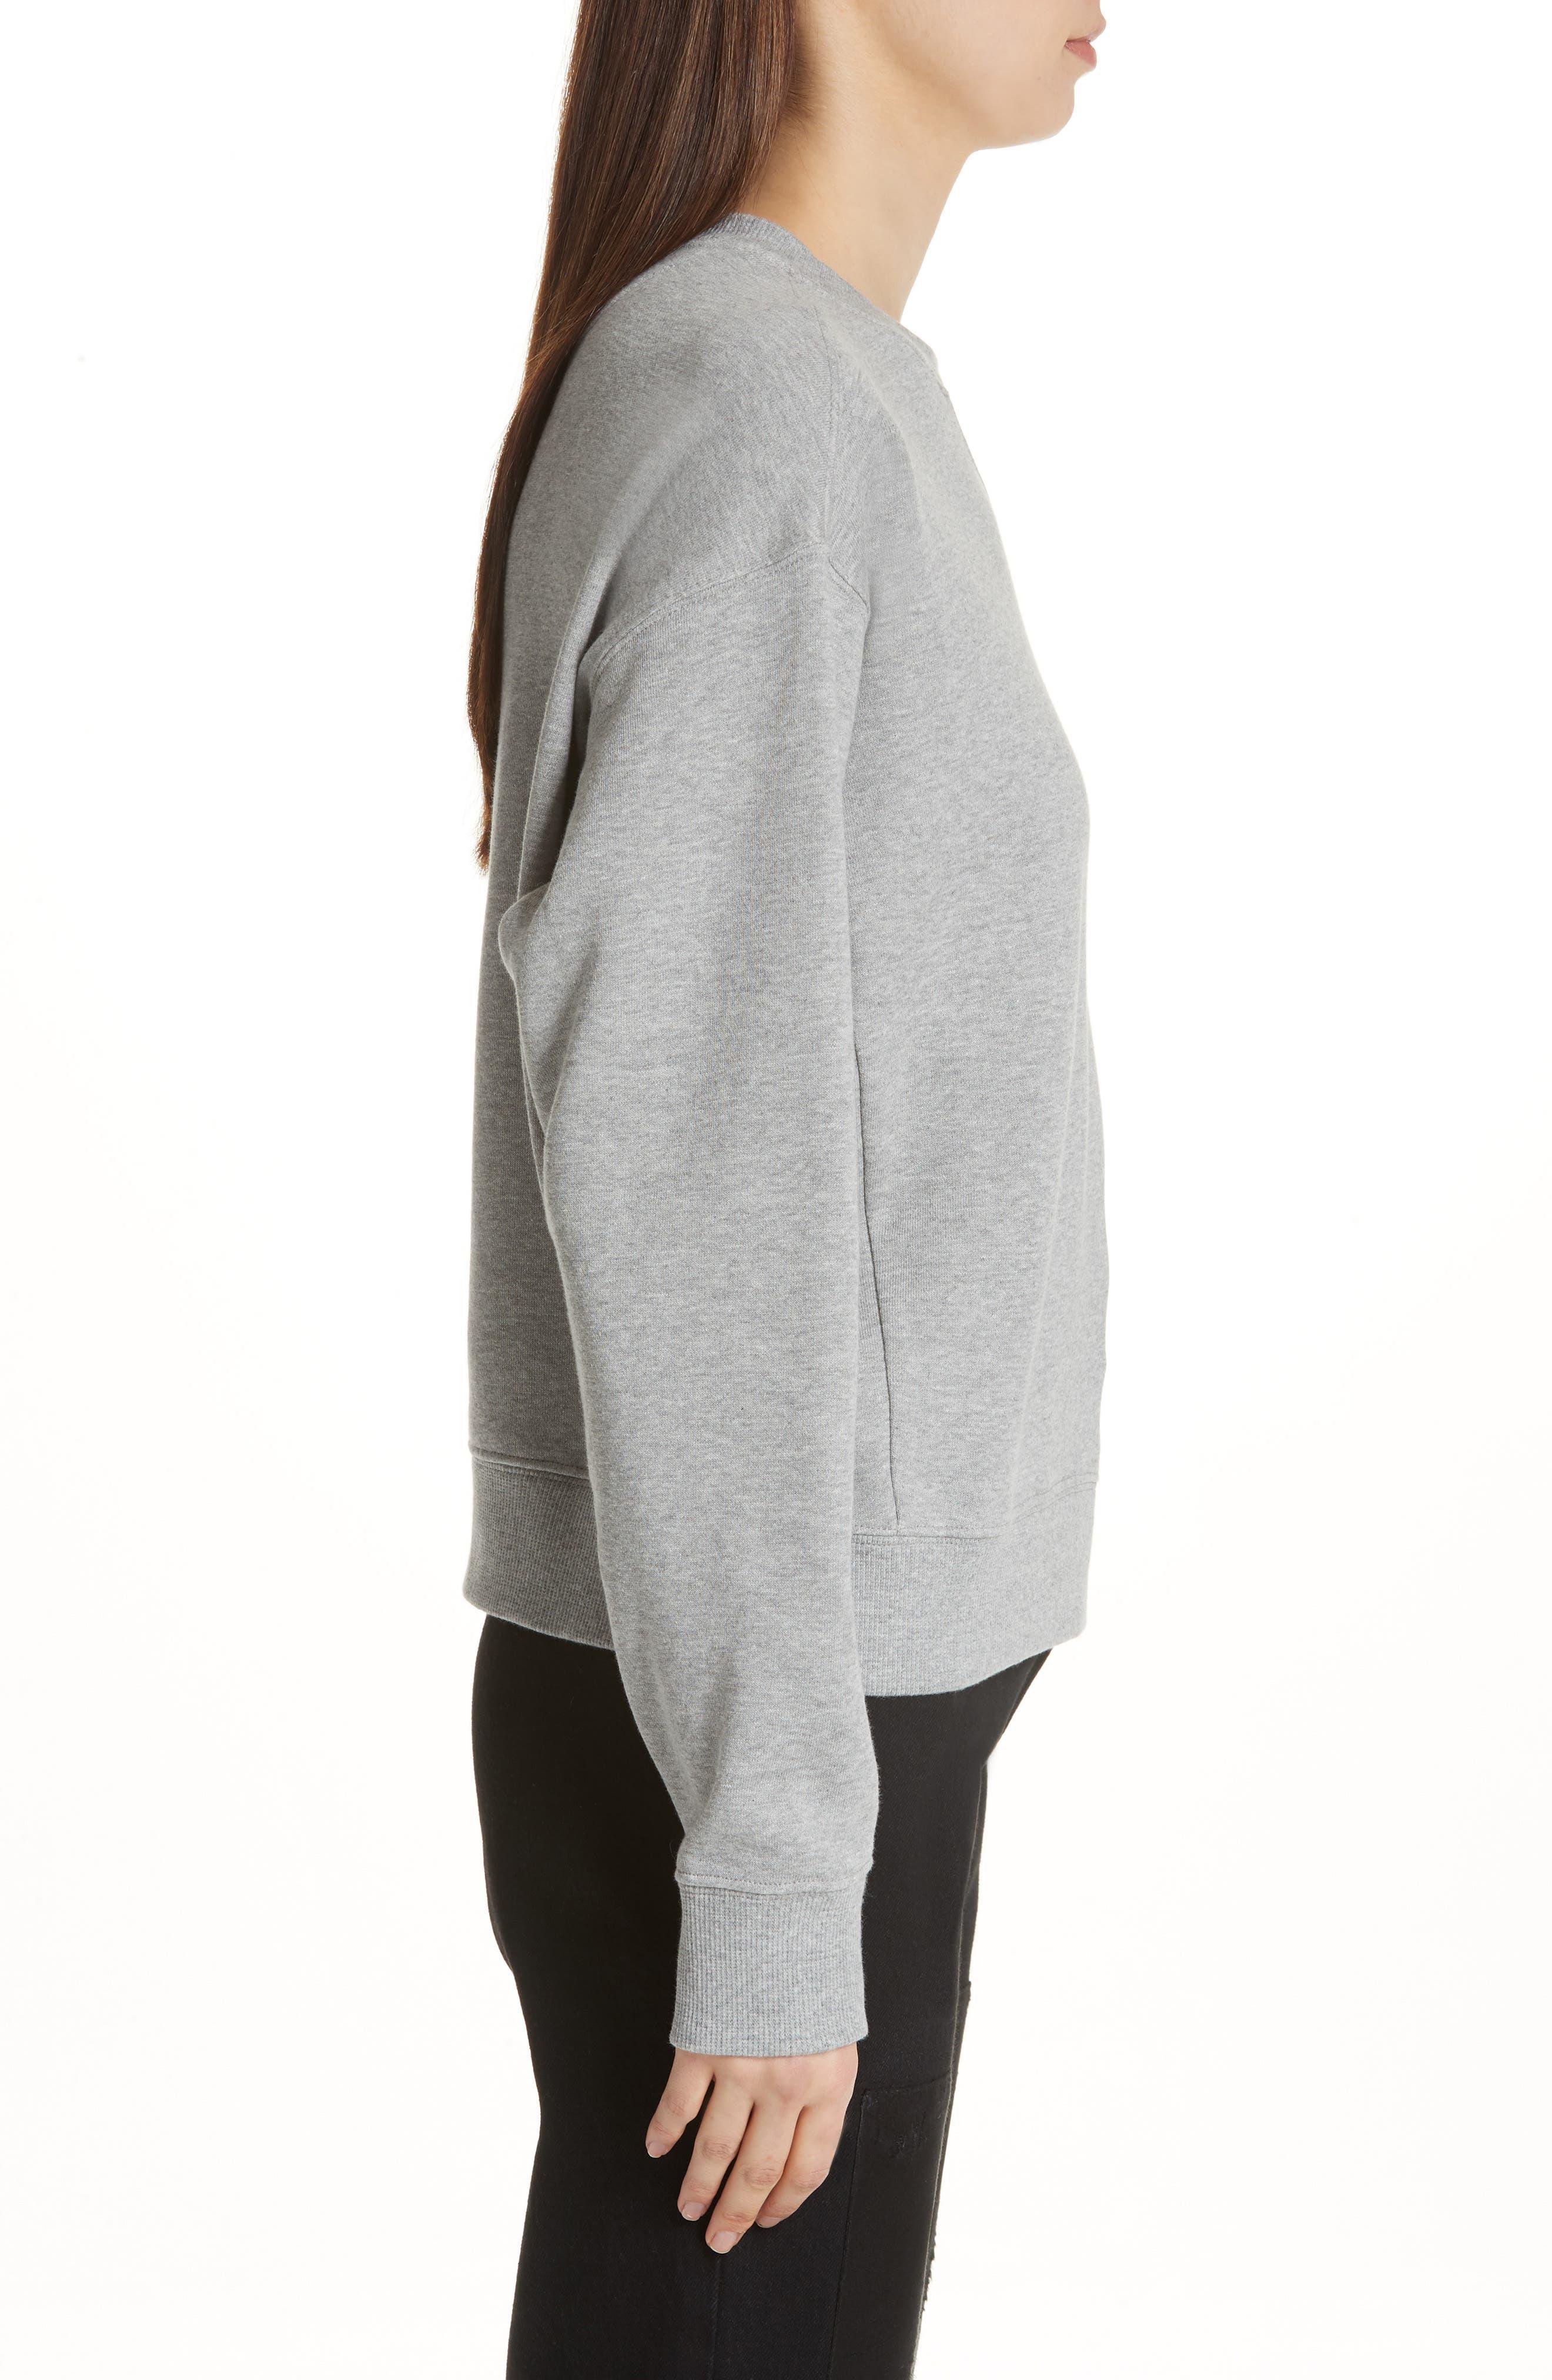 Brooke Shields Patch Sweatshirt,                             Alternate thumbnail 3, color,                             Grey